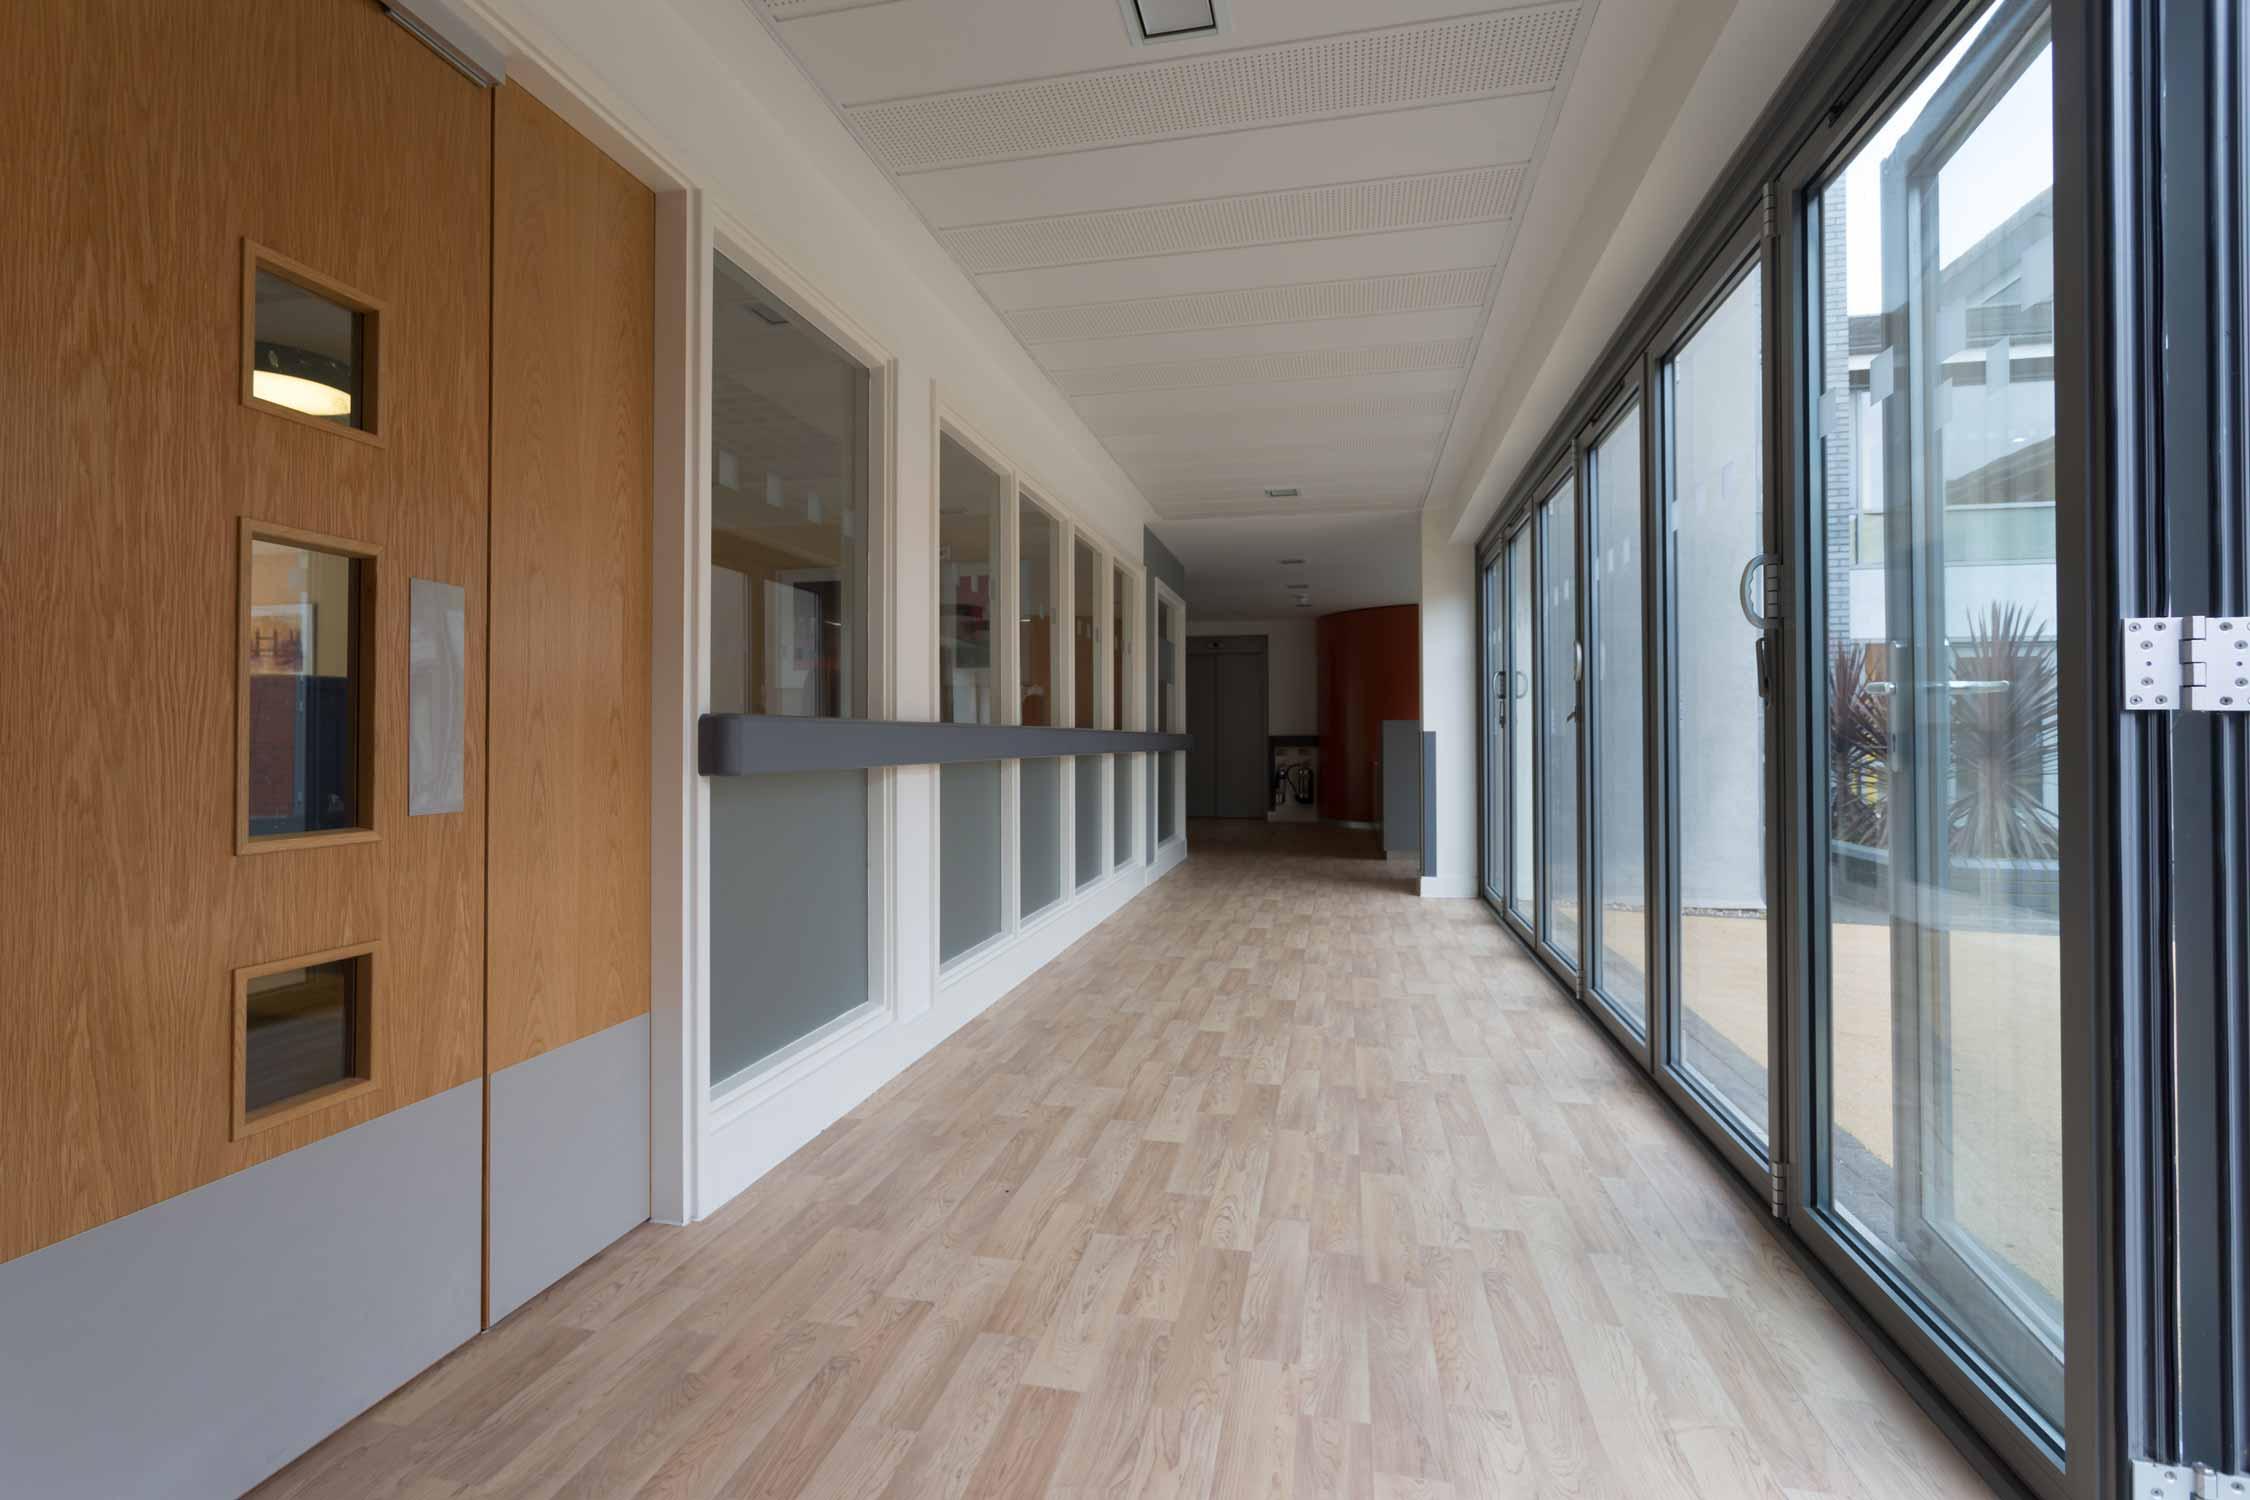 bi-fold doors, architect, corridor care home